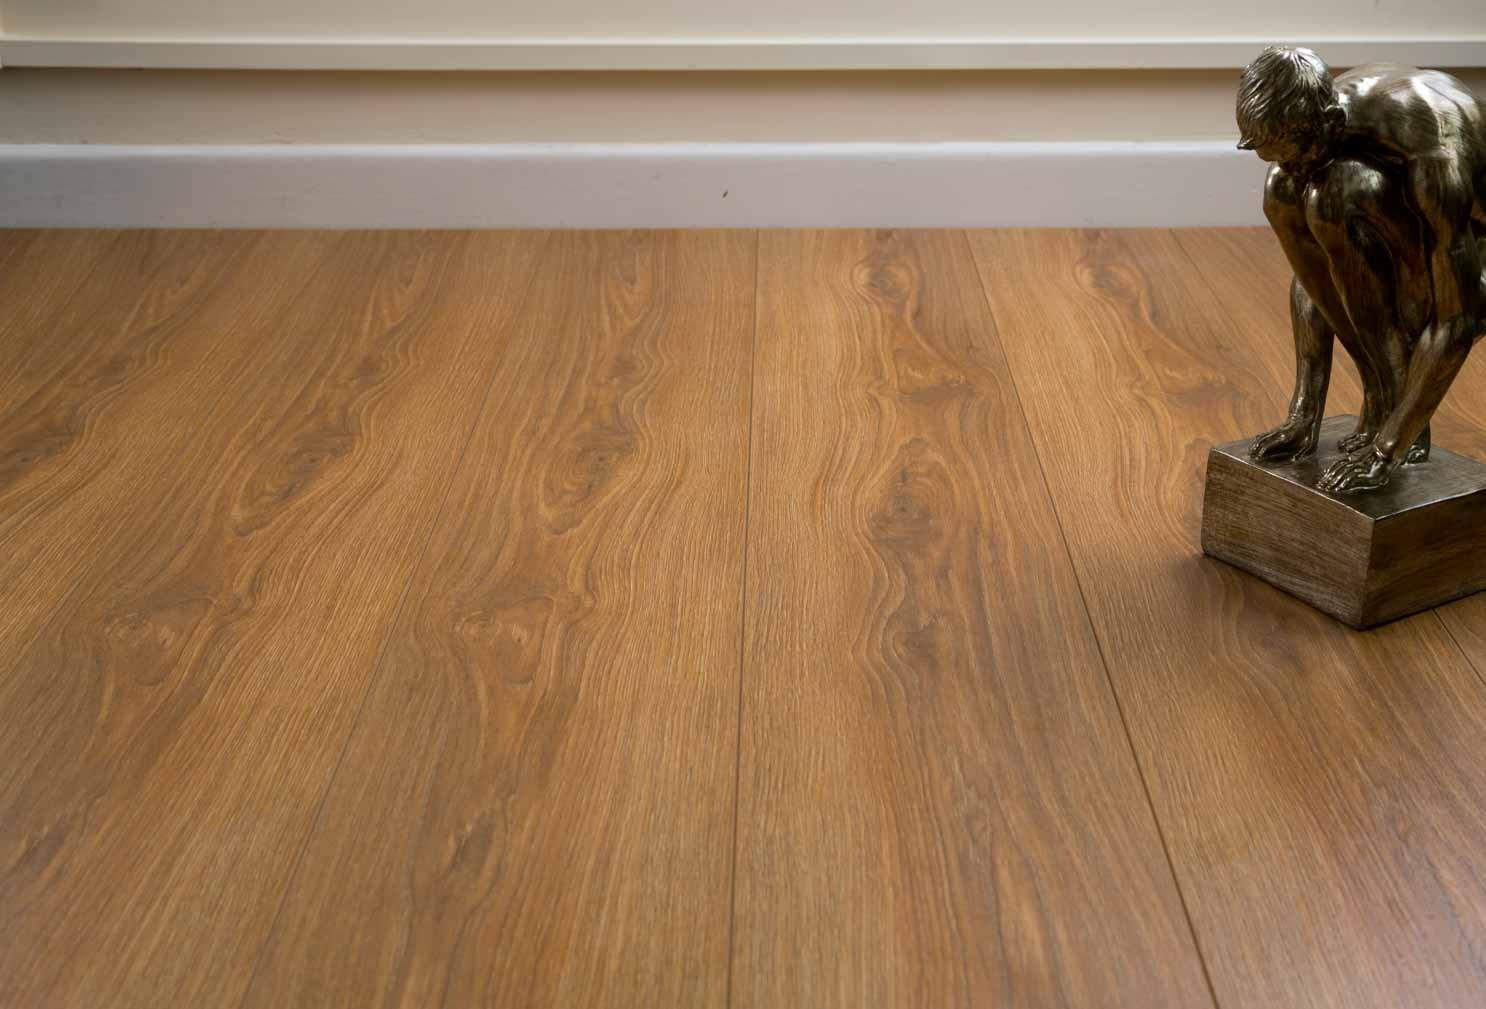 Oak laminate flooring burnbury 8mm french oak laminate flooring ANQXCFU